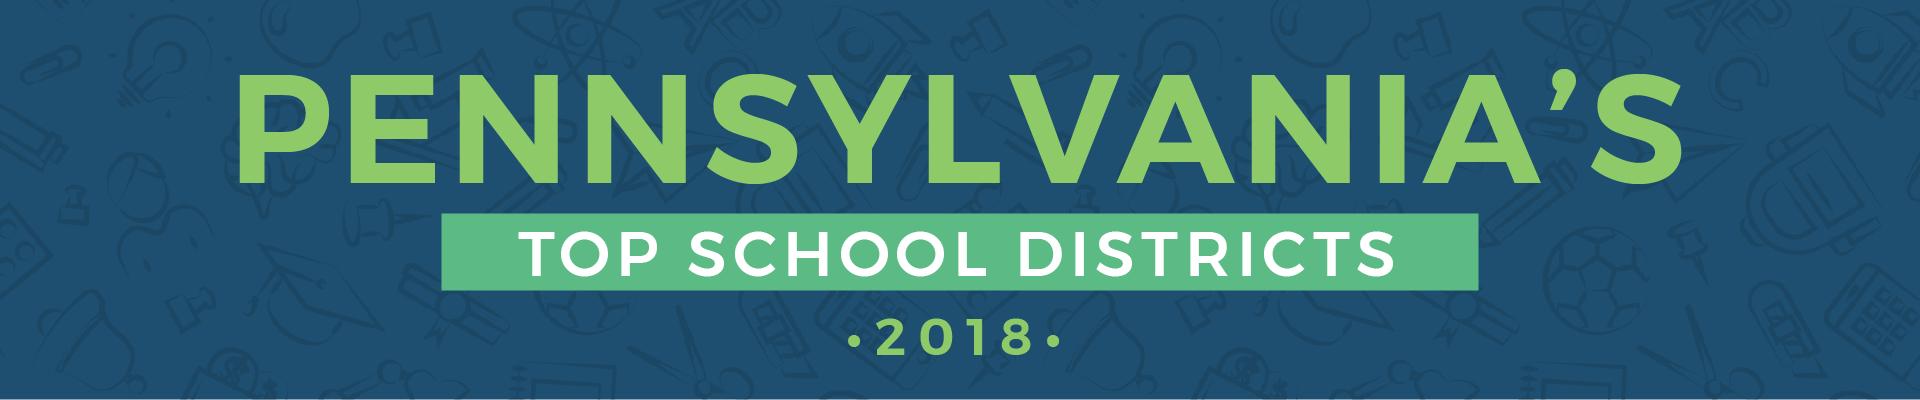 Top School Districts In Pennsylvania 2018